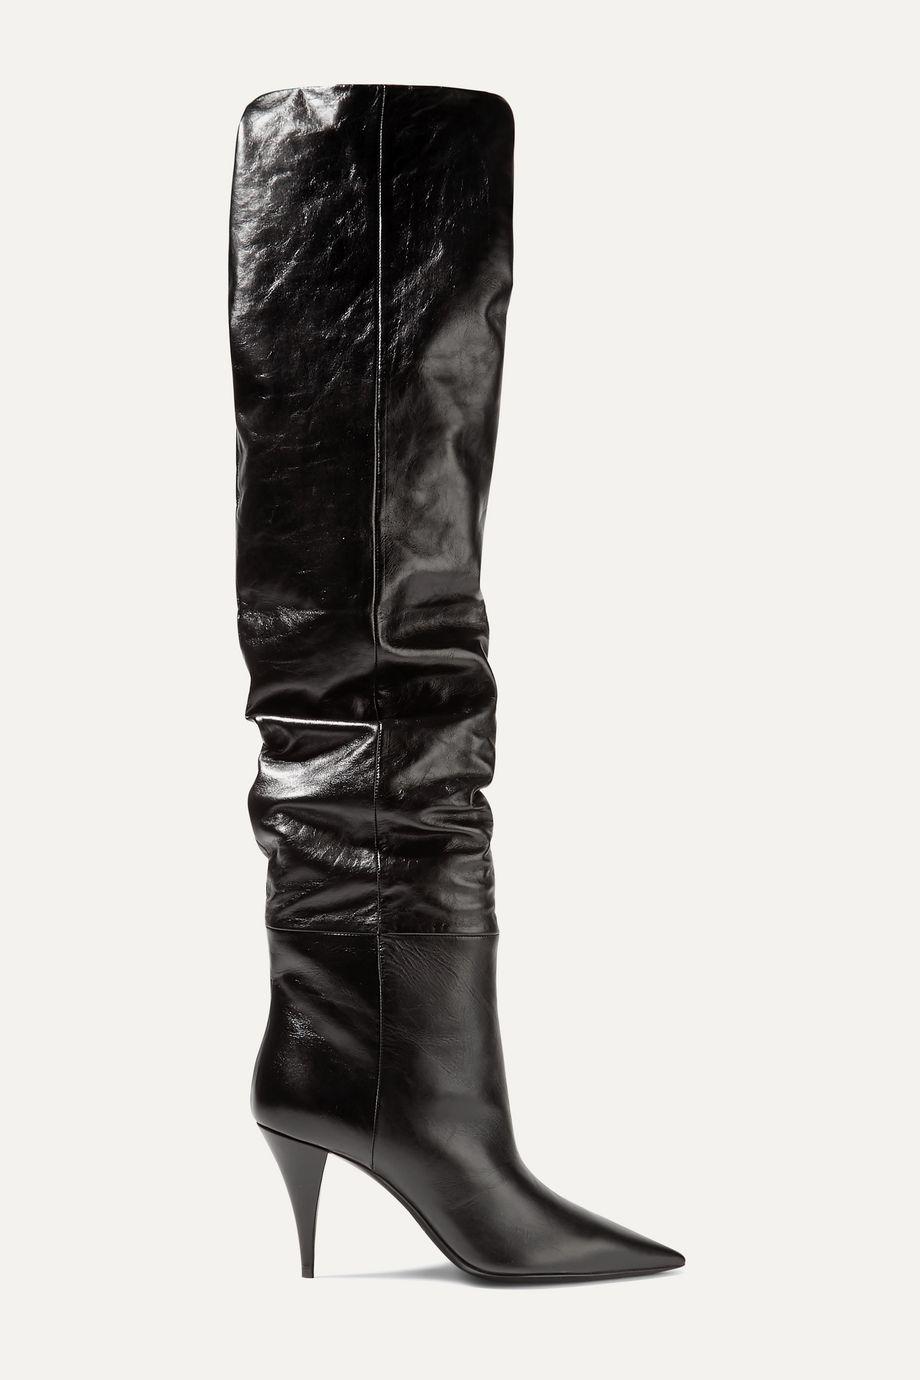 SAINT LAURENT Kiki textured-leather over-the-knee boots